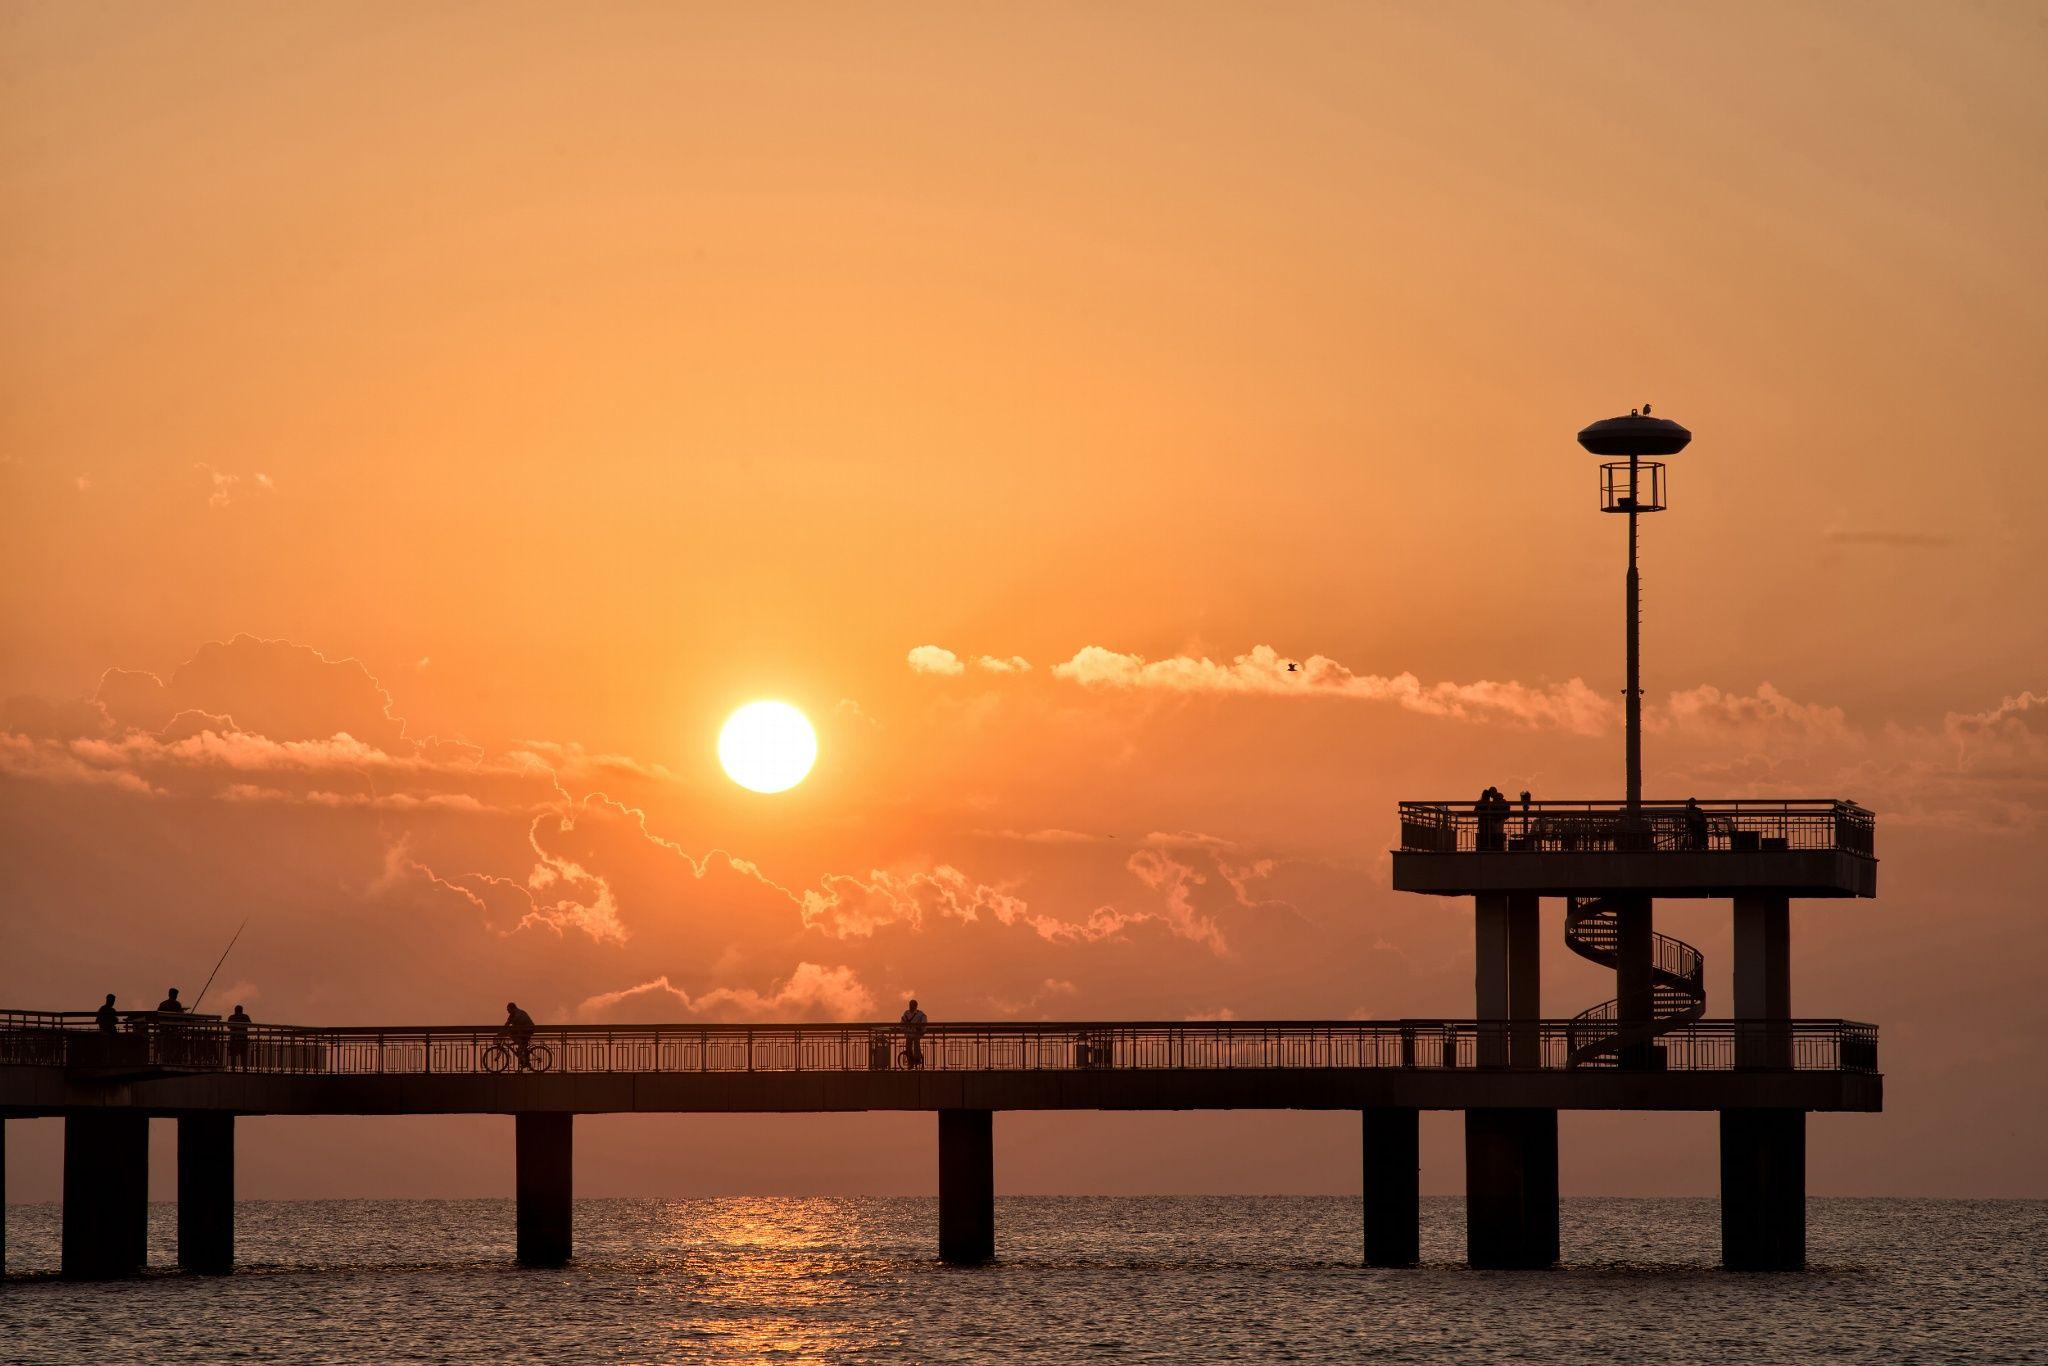 Romantic sunset moment on bridge in Burgas, Bulgaria by Radoslav Stoilov on 500px